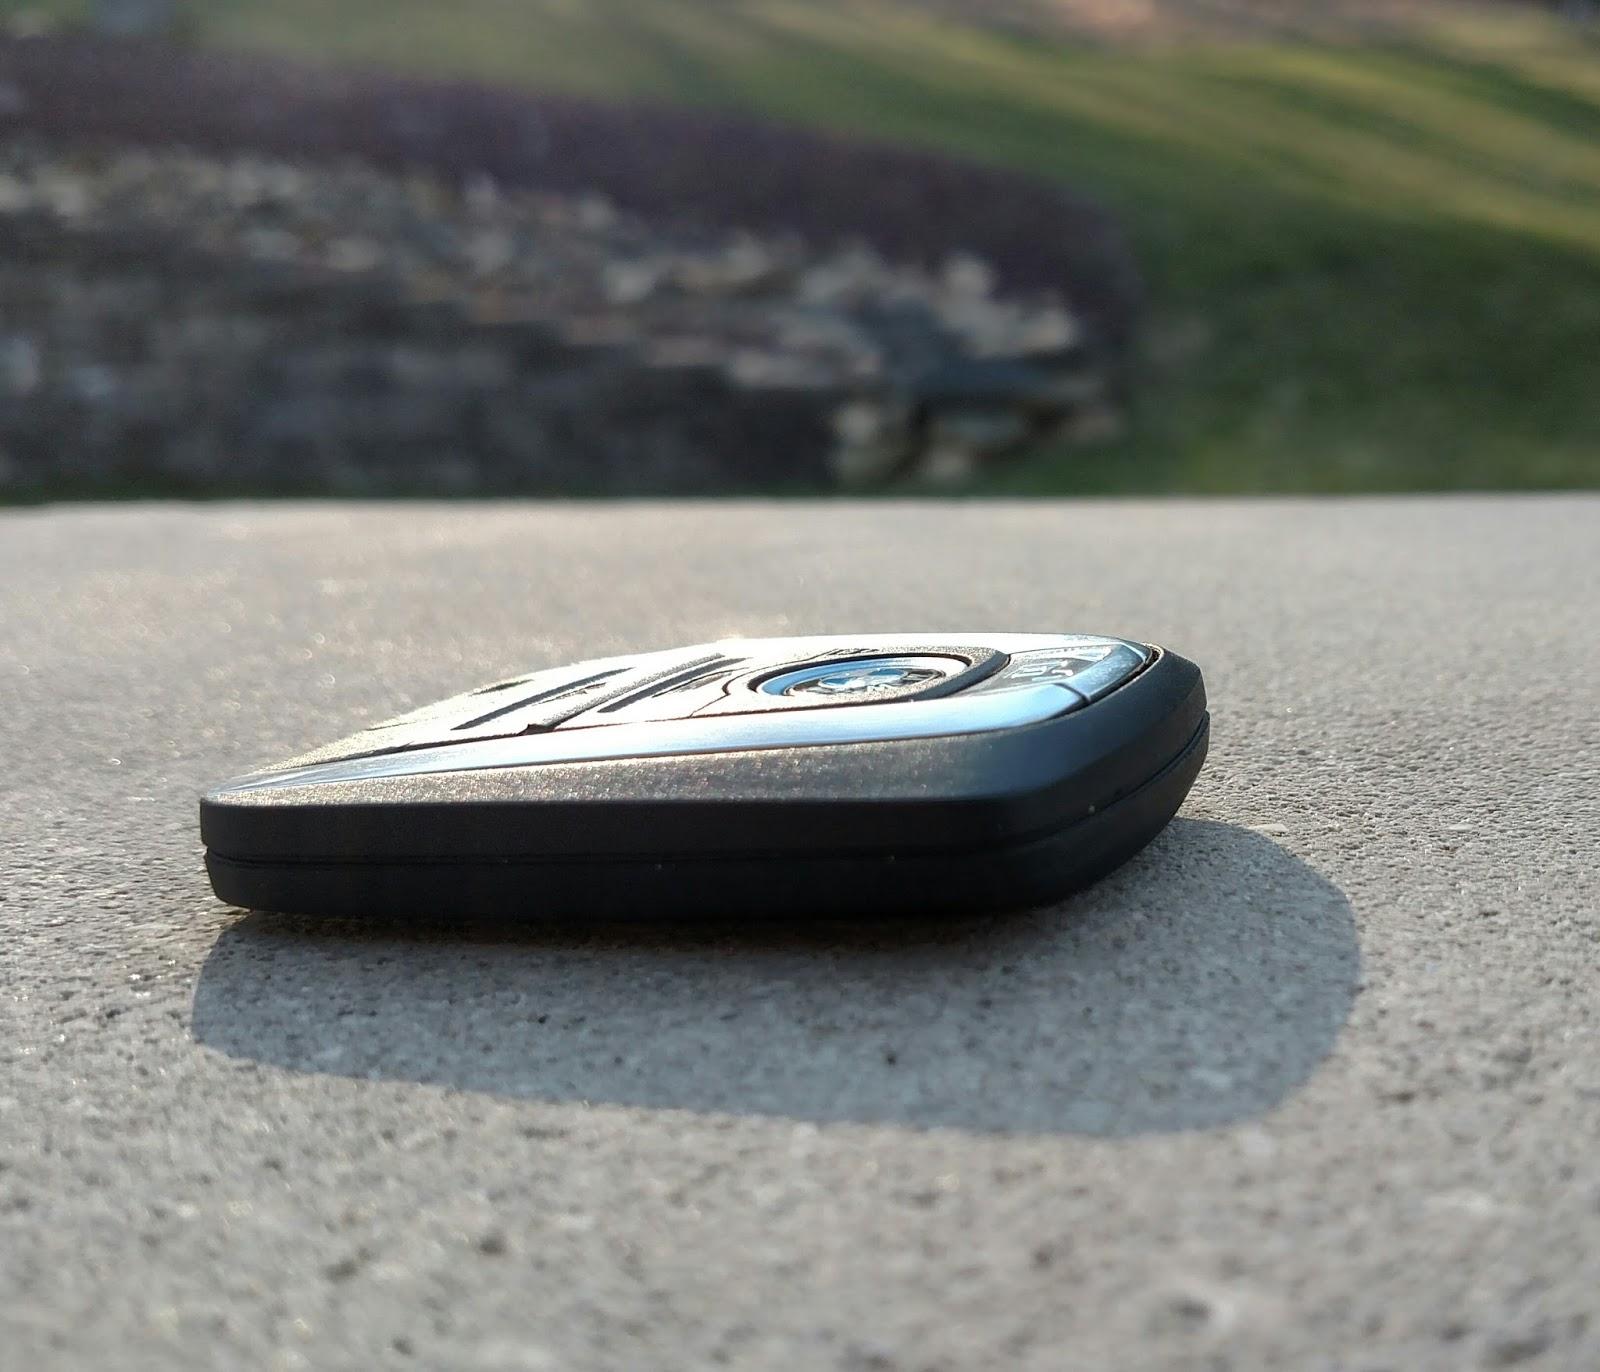 The Electric BMW i3: BMW i3 Key Fob Fail